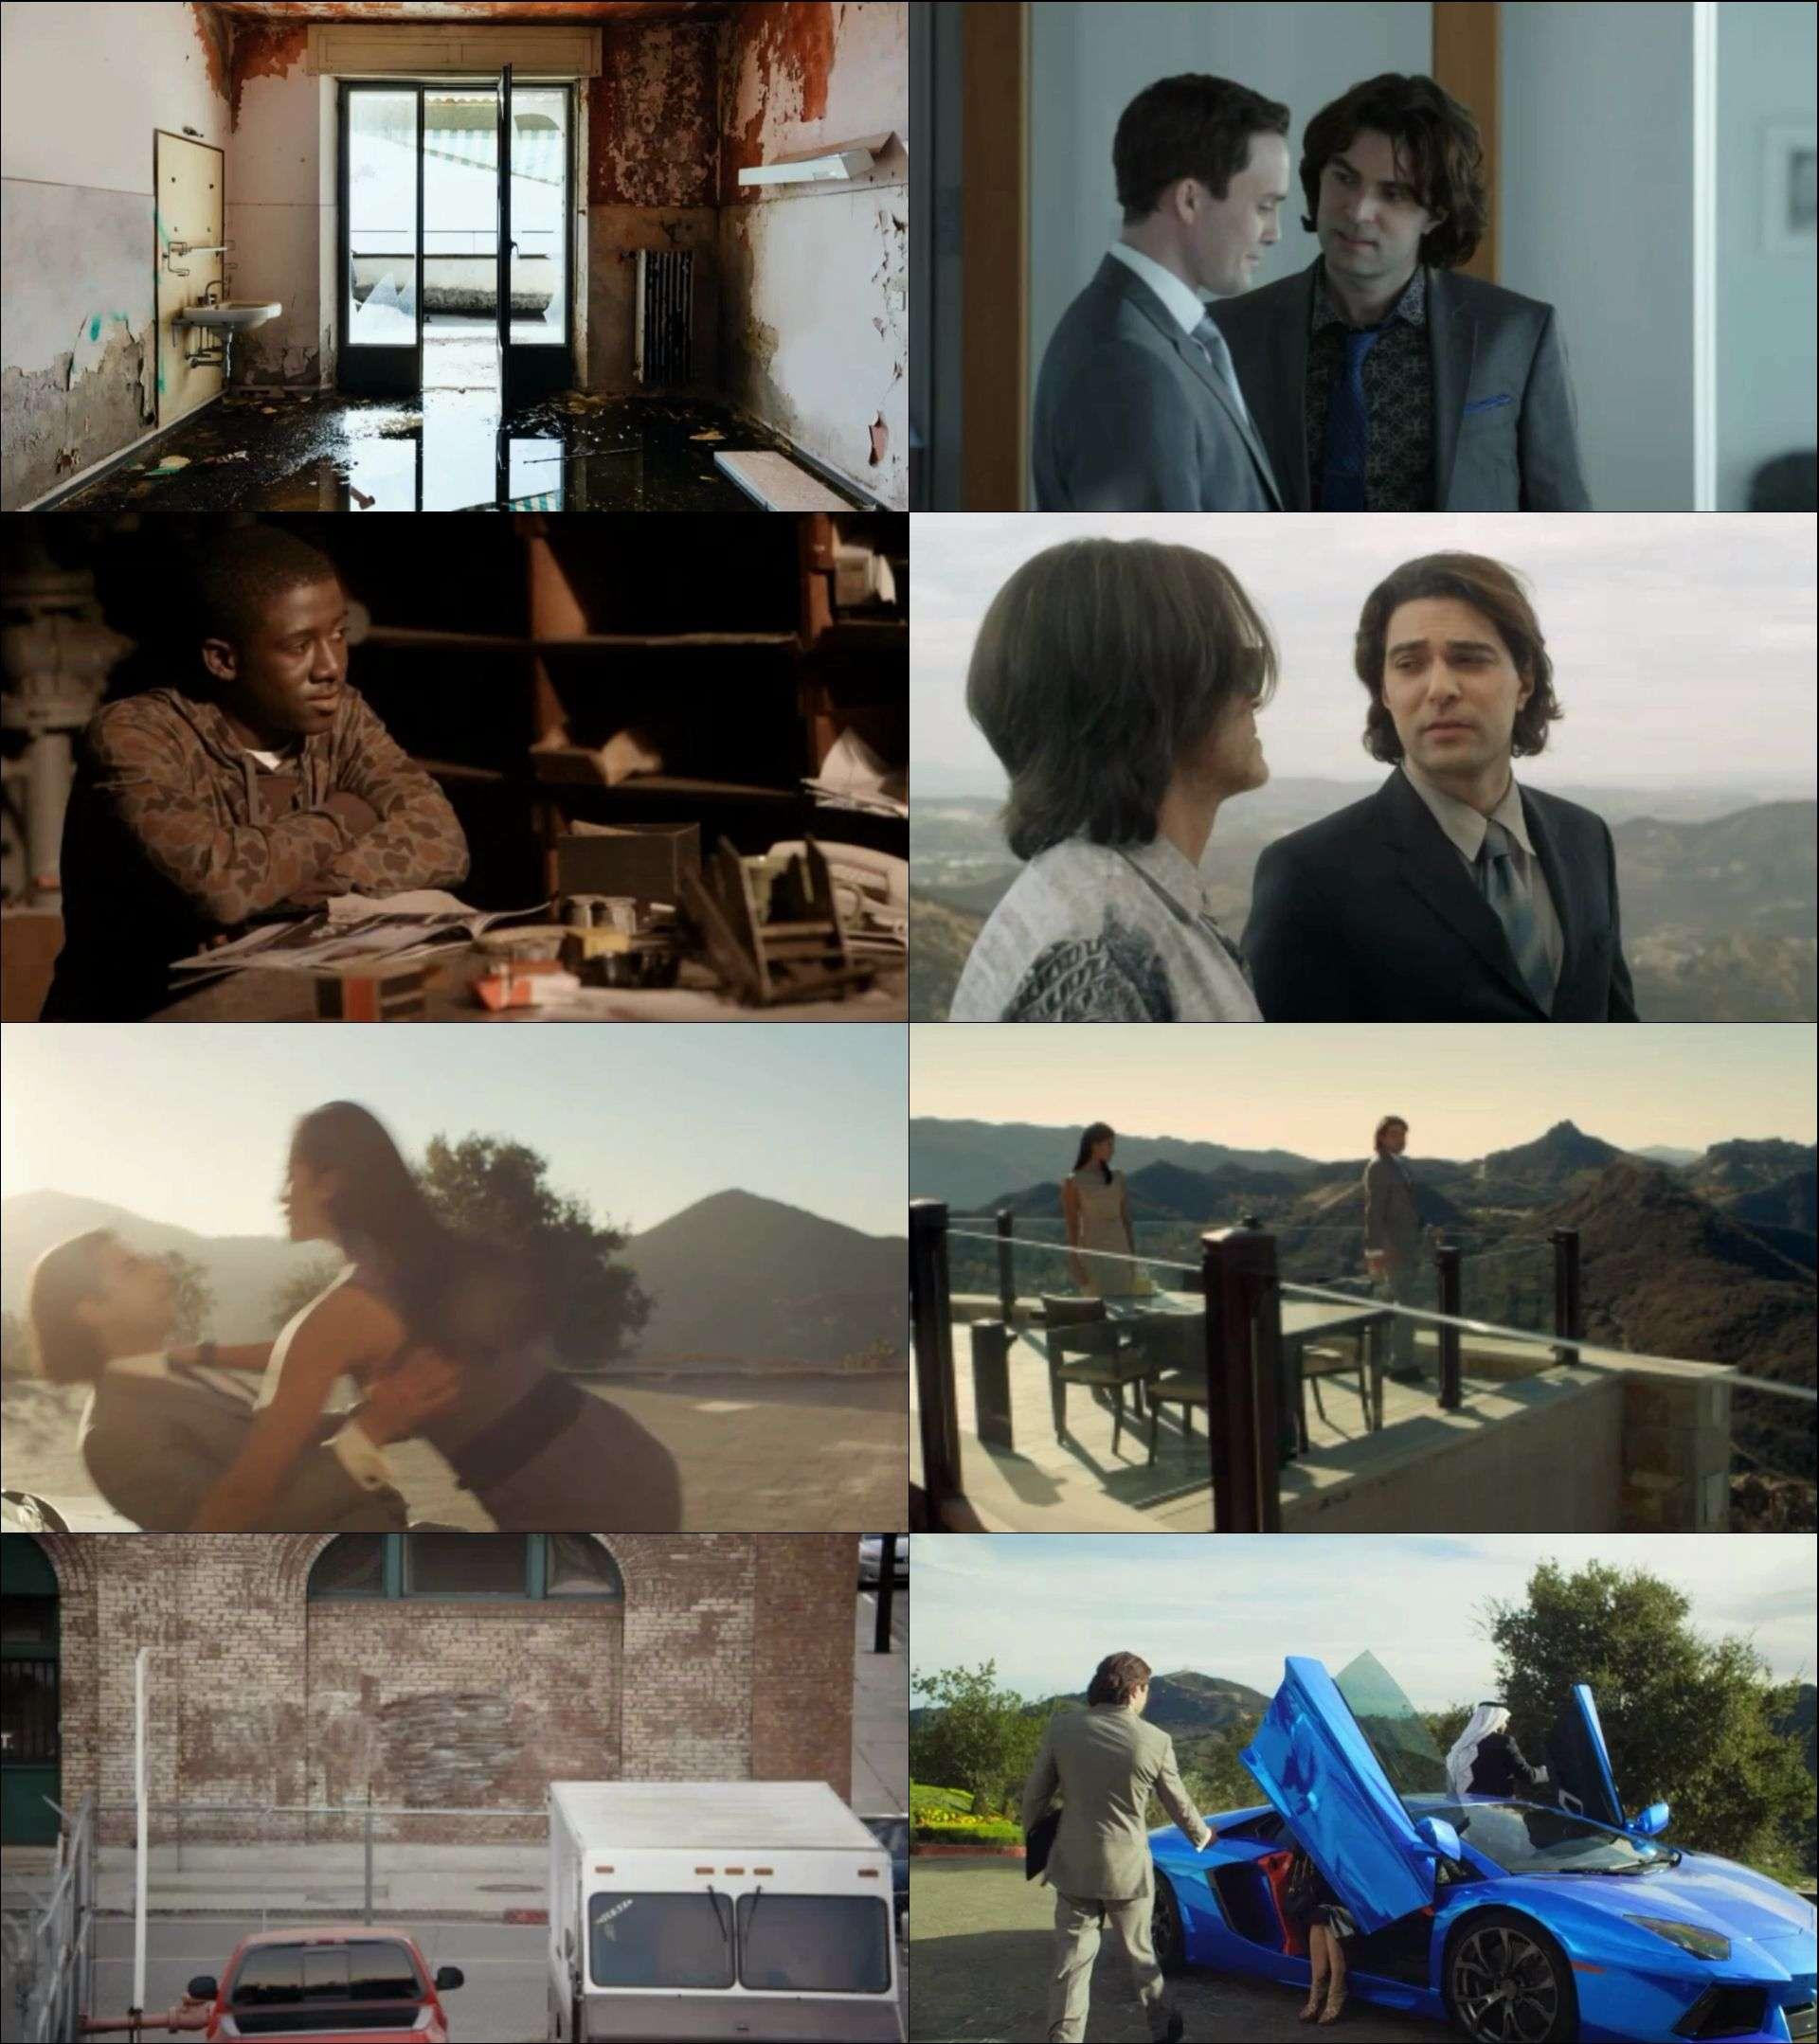 Komisyoncu - Pocket Listing (2015) türkçe dublaj film indir